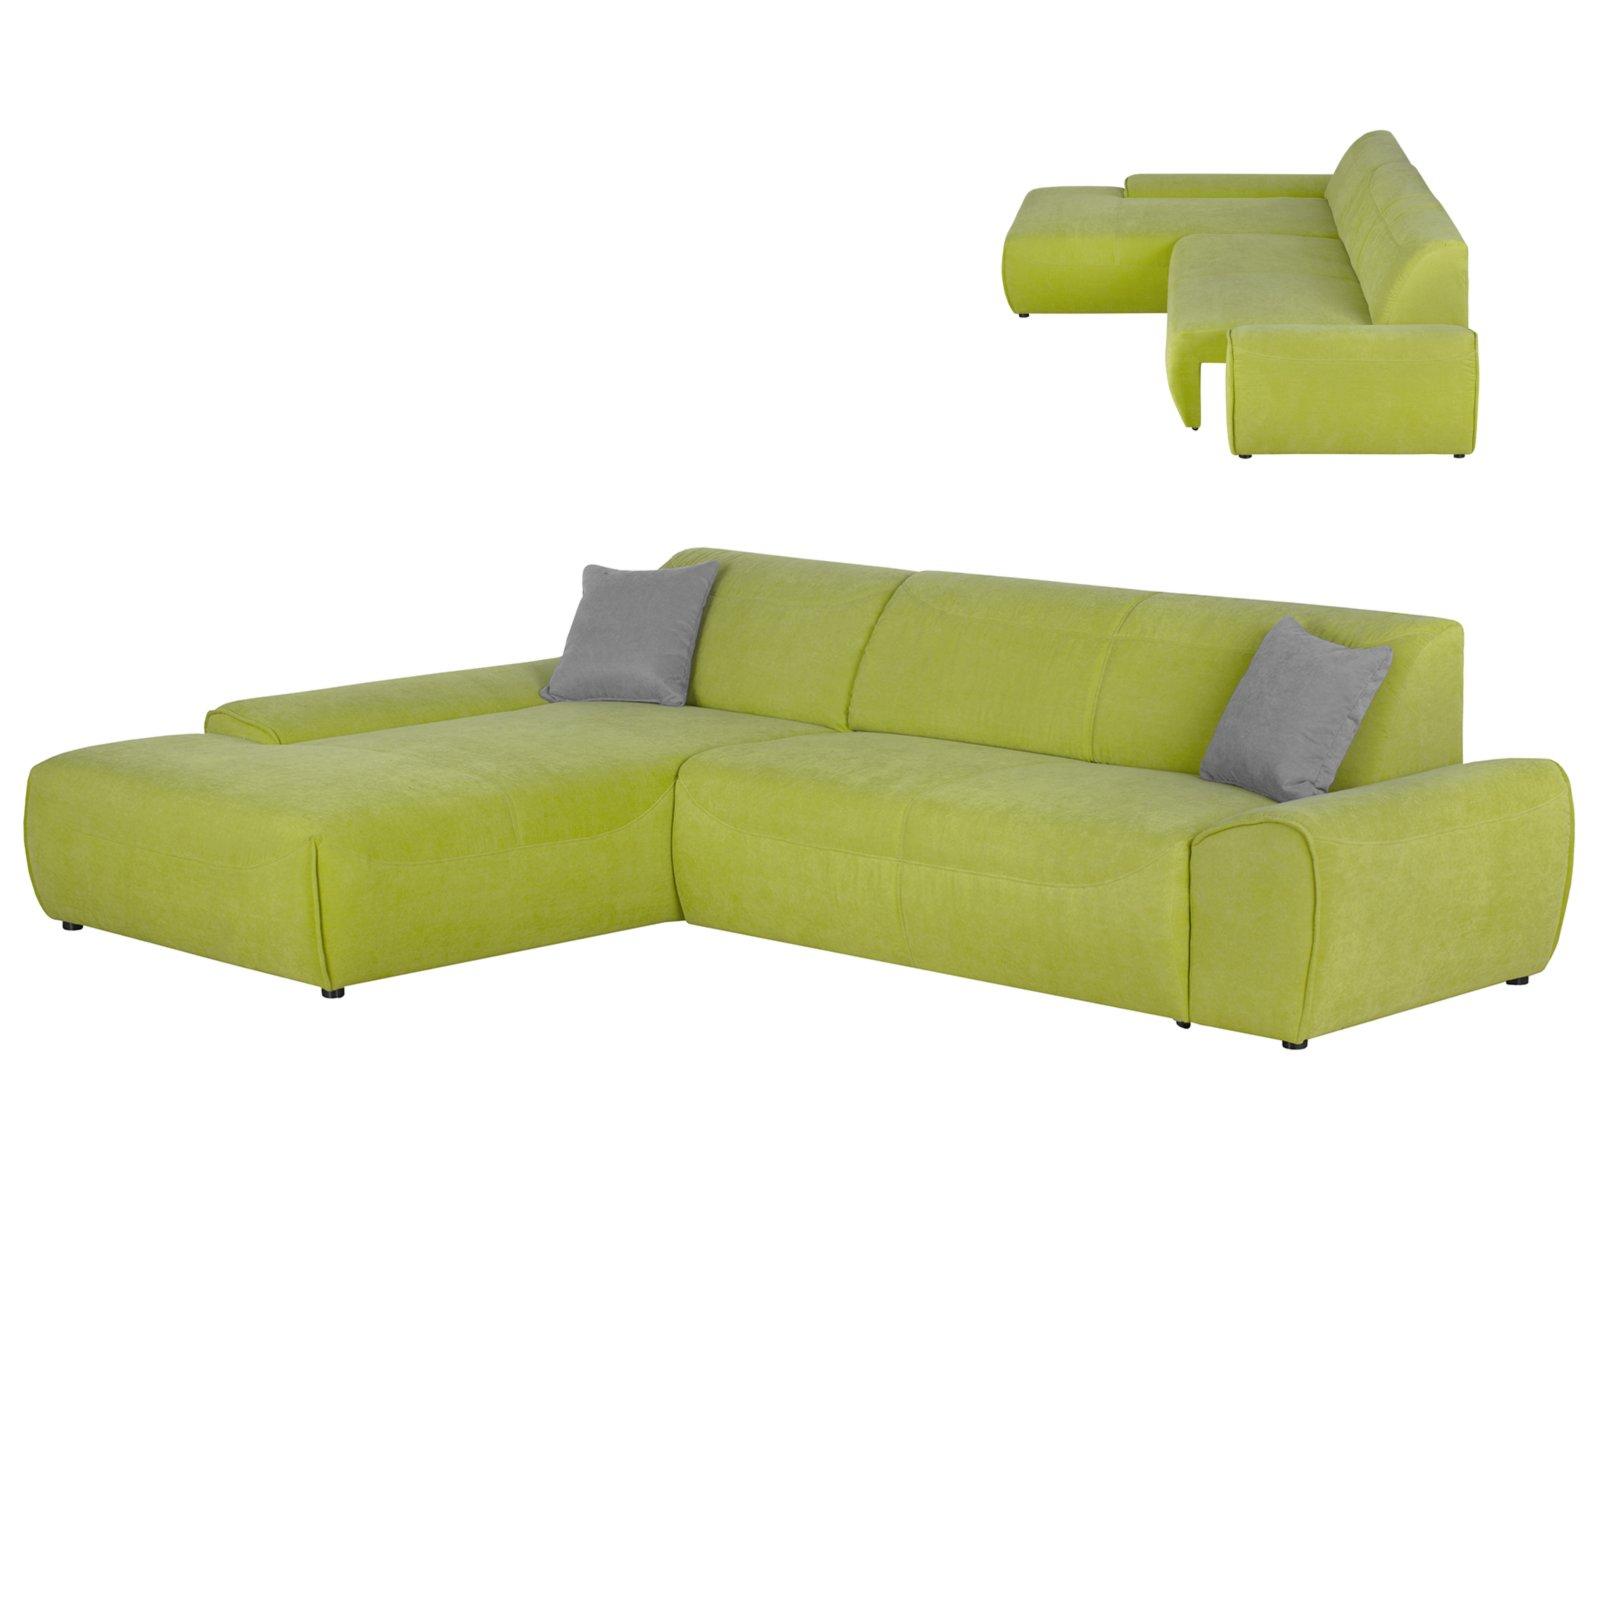 ecksofa gr n sitzauszug rechts ecksofas l form sofas couches m bel roller. Black Bedroom Furniture Sets. Home Design Ideas